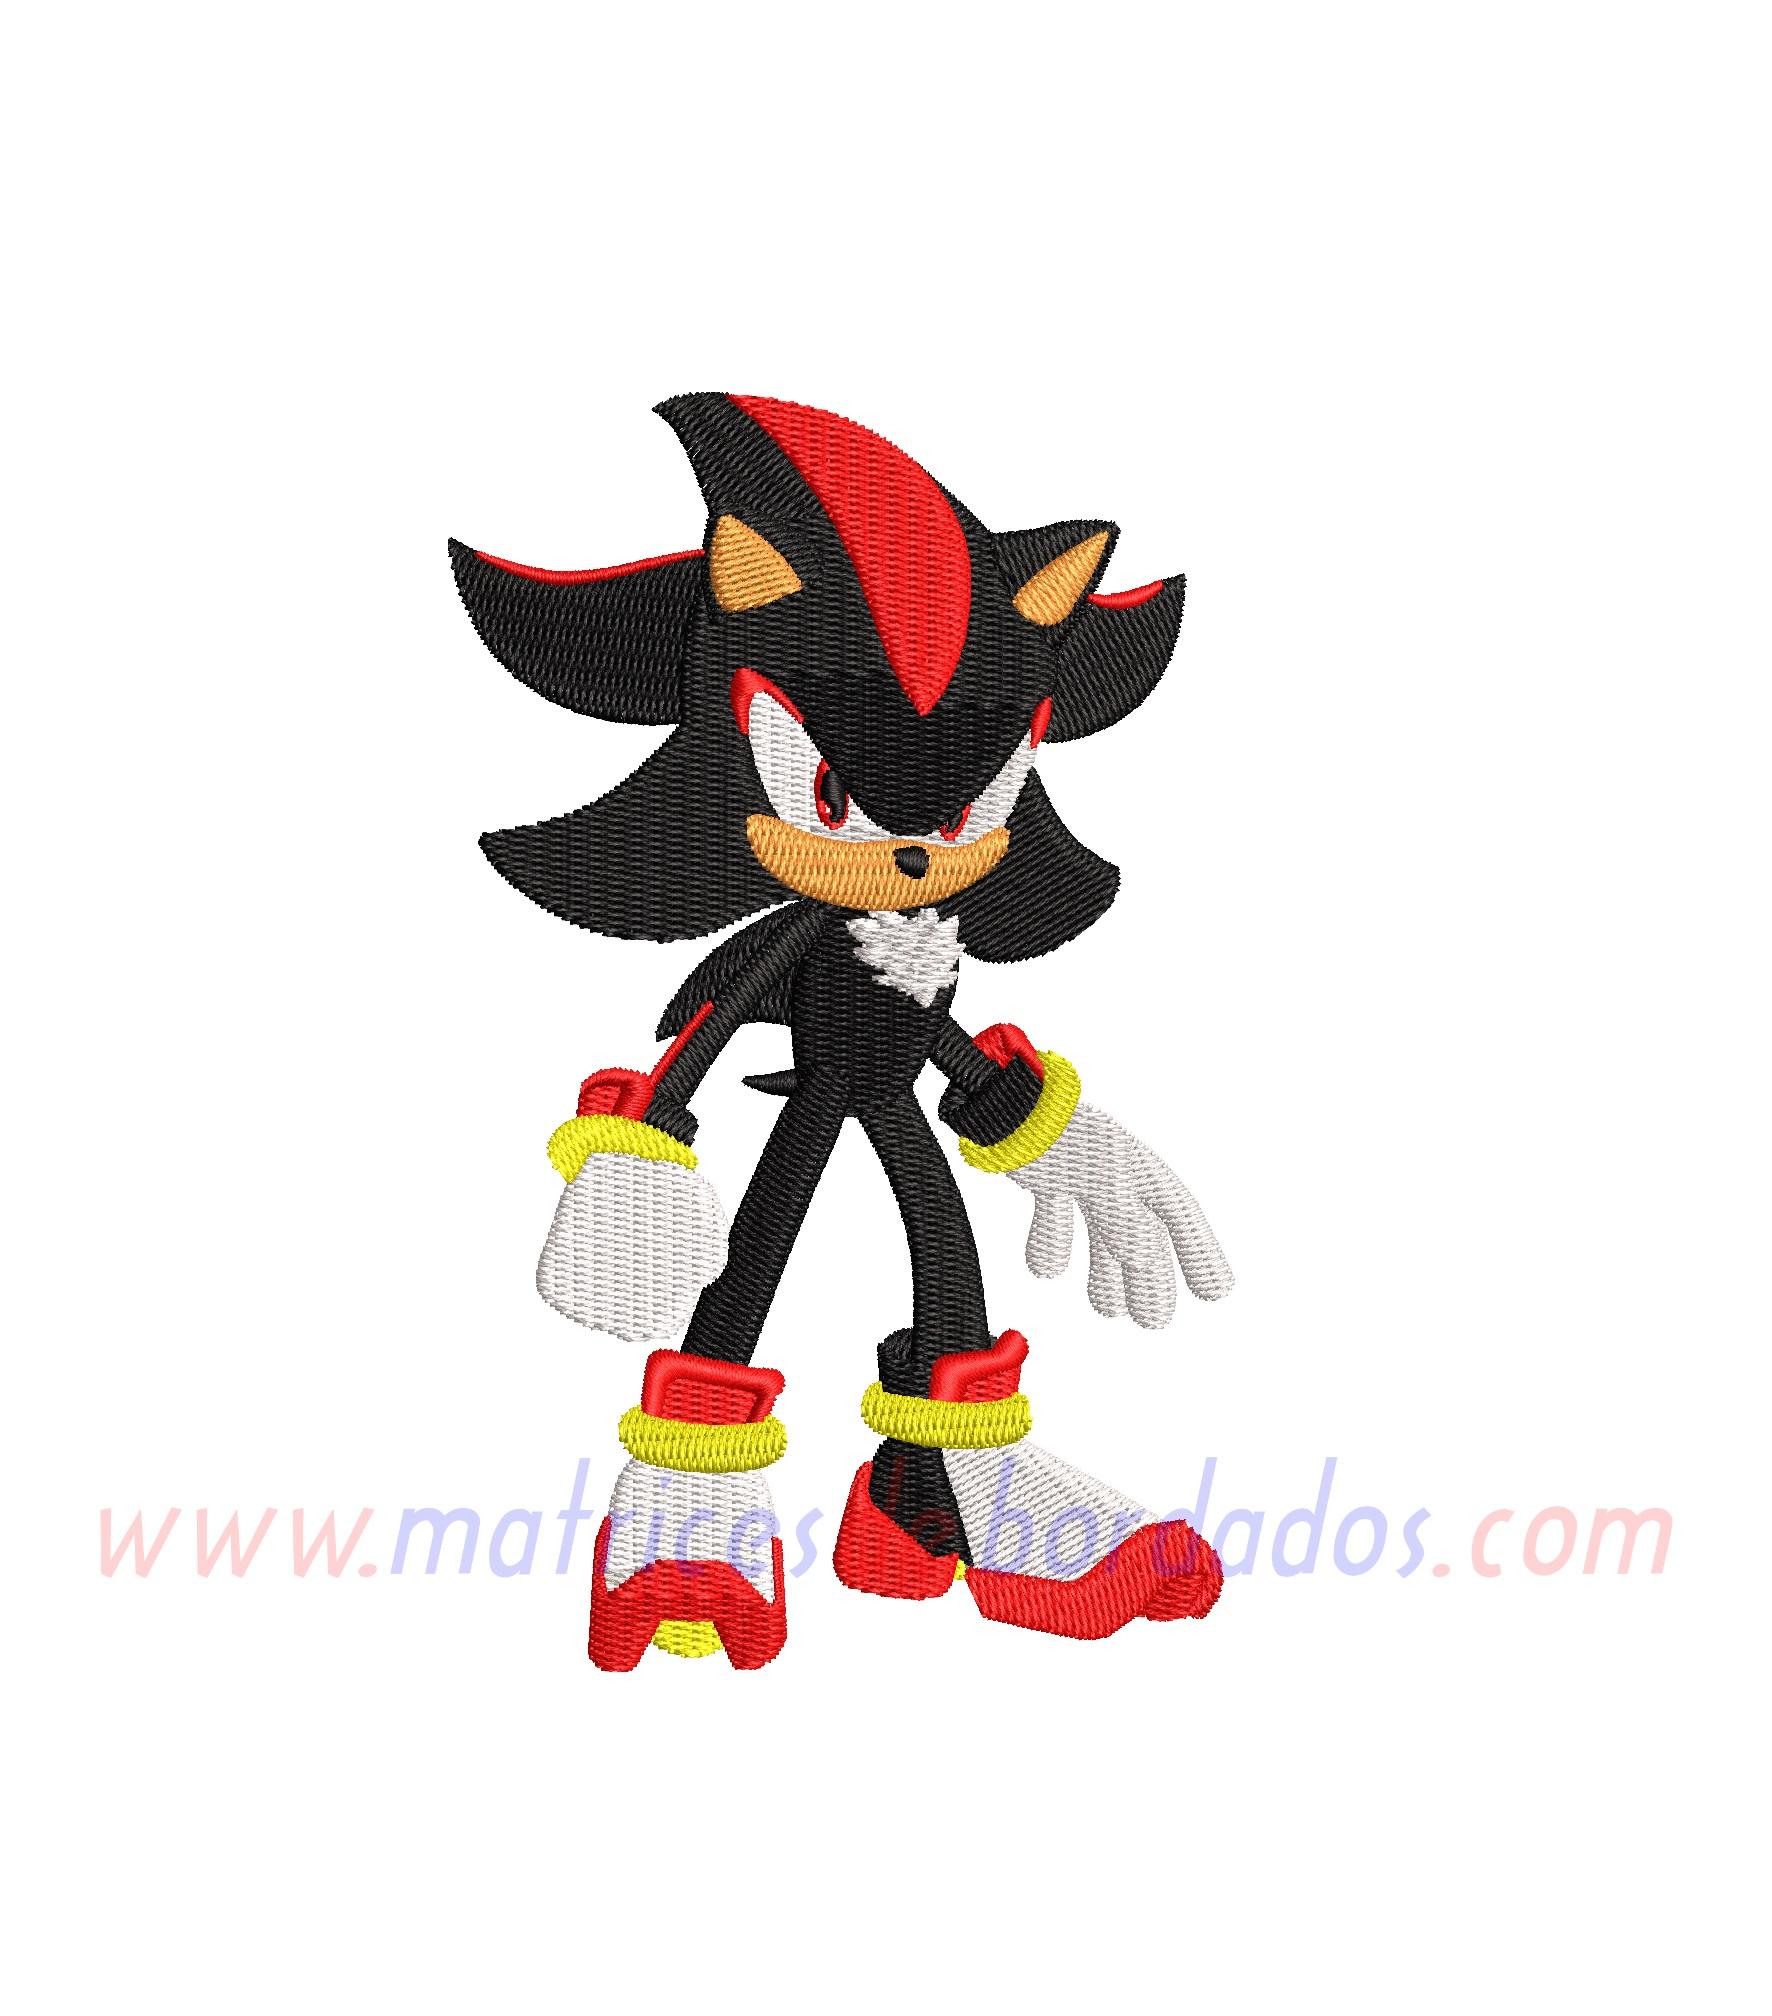 AP29MG - Shadow de Sonic